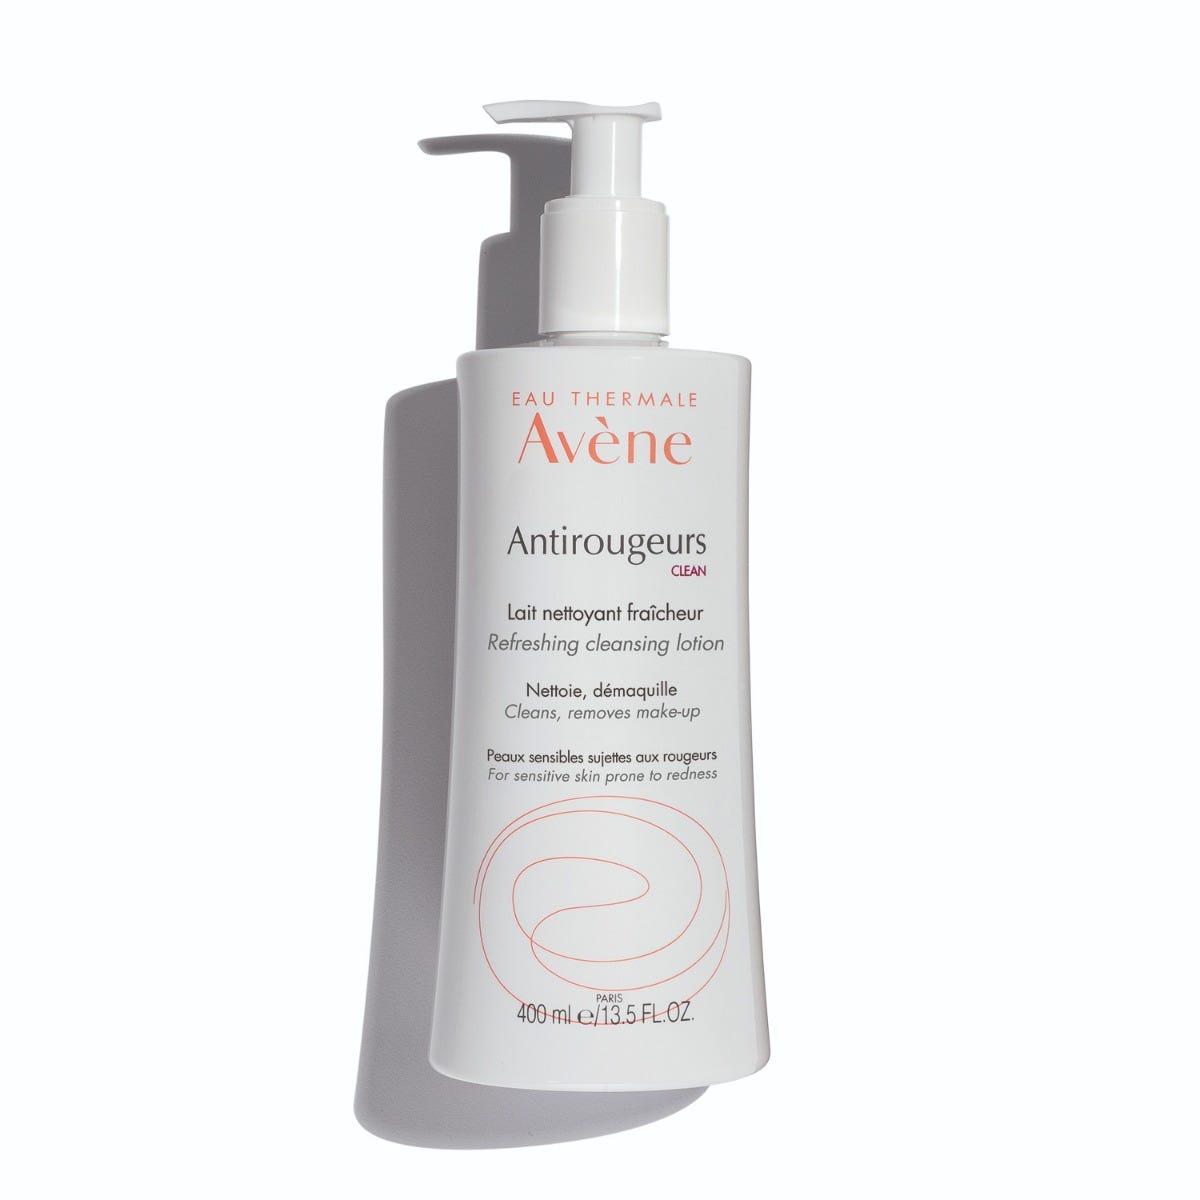 Avene antirougeurs clean refreshing cleansing lotion 400ml shadow